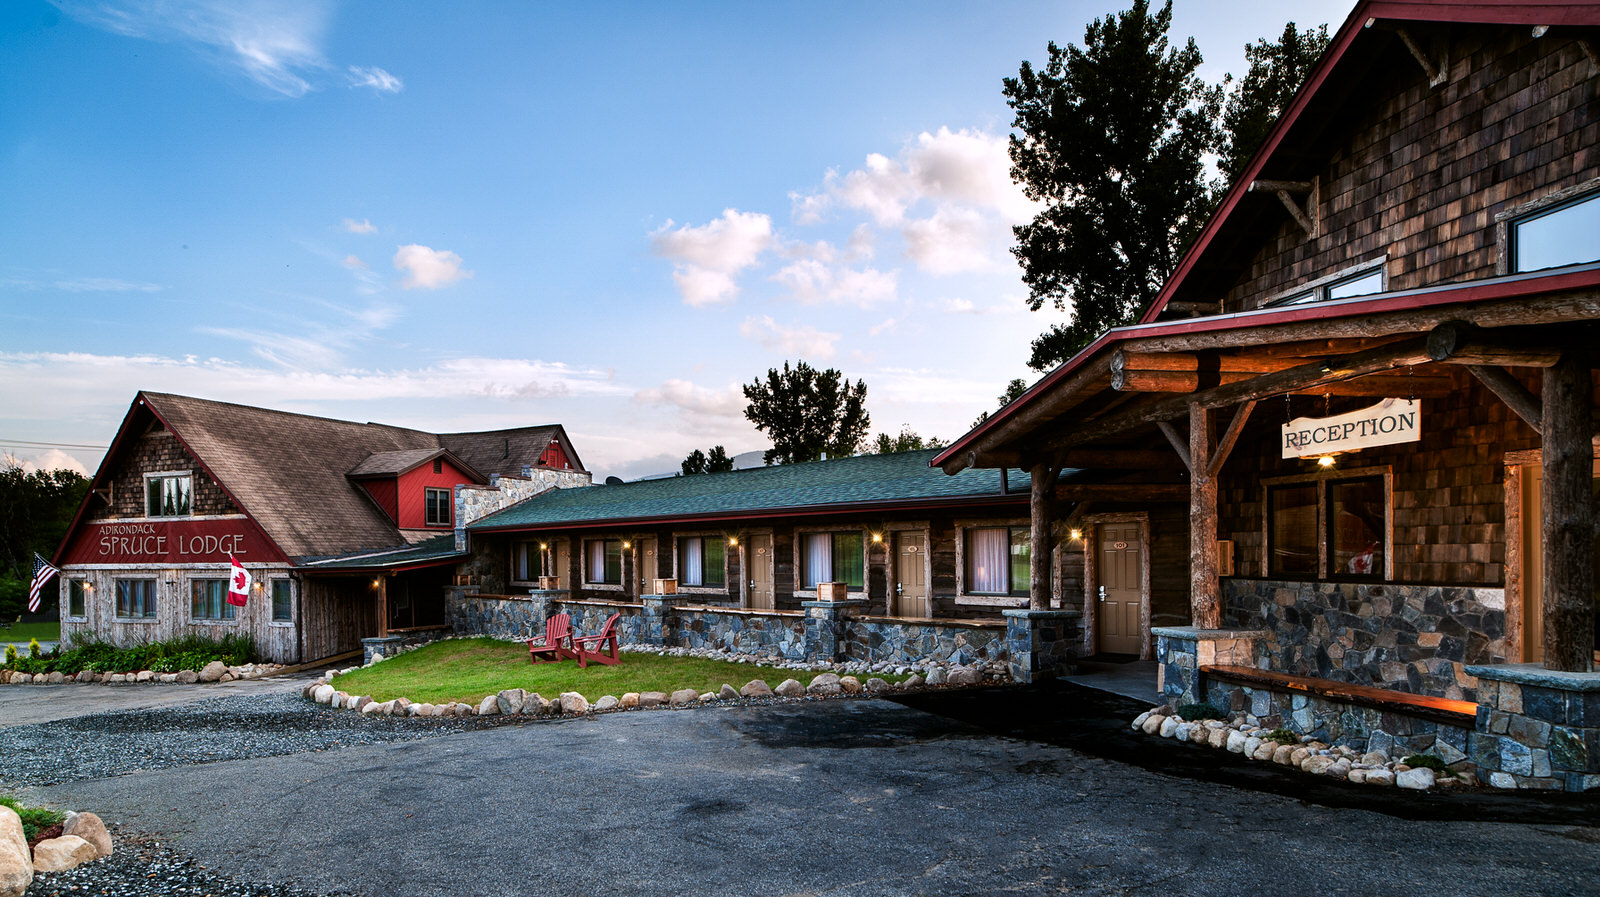 Adk-Spruce-Lodge-2048px-56.jpg